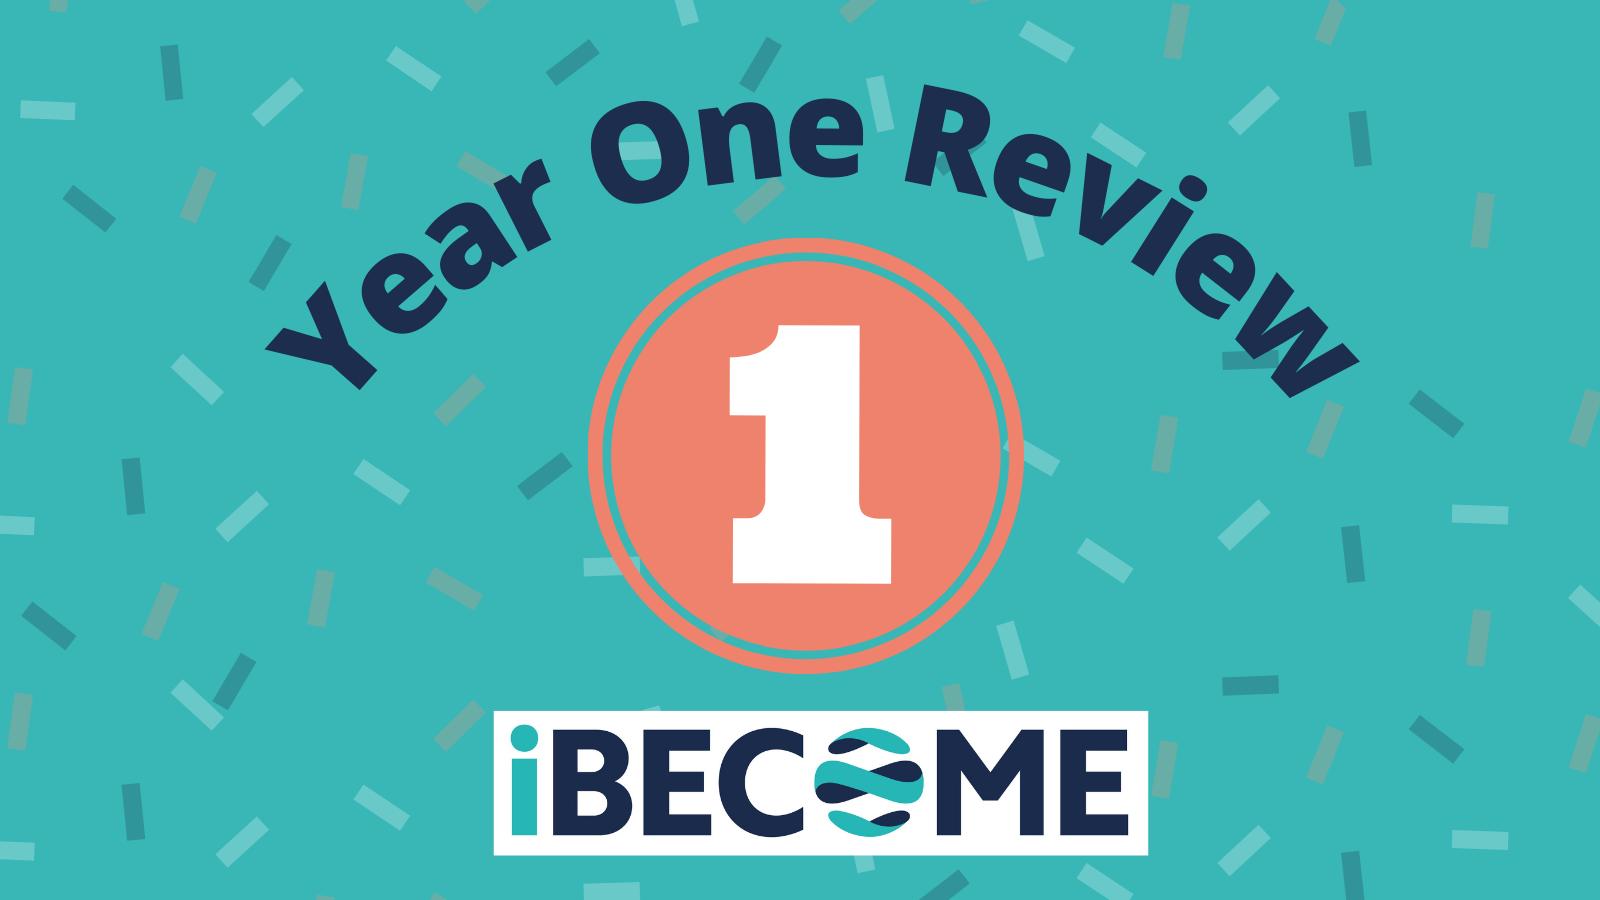 ibecome year 1 image